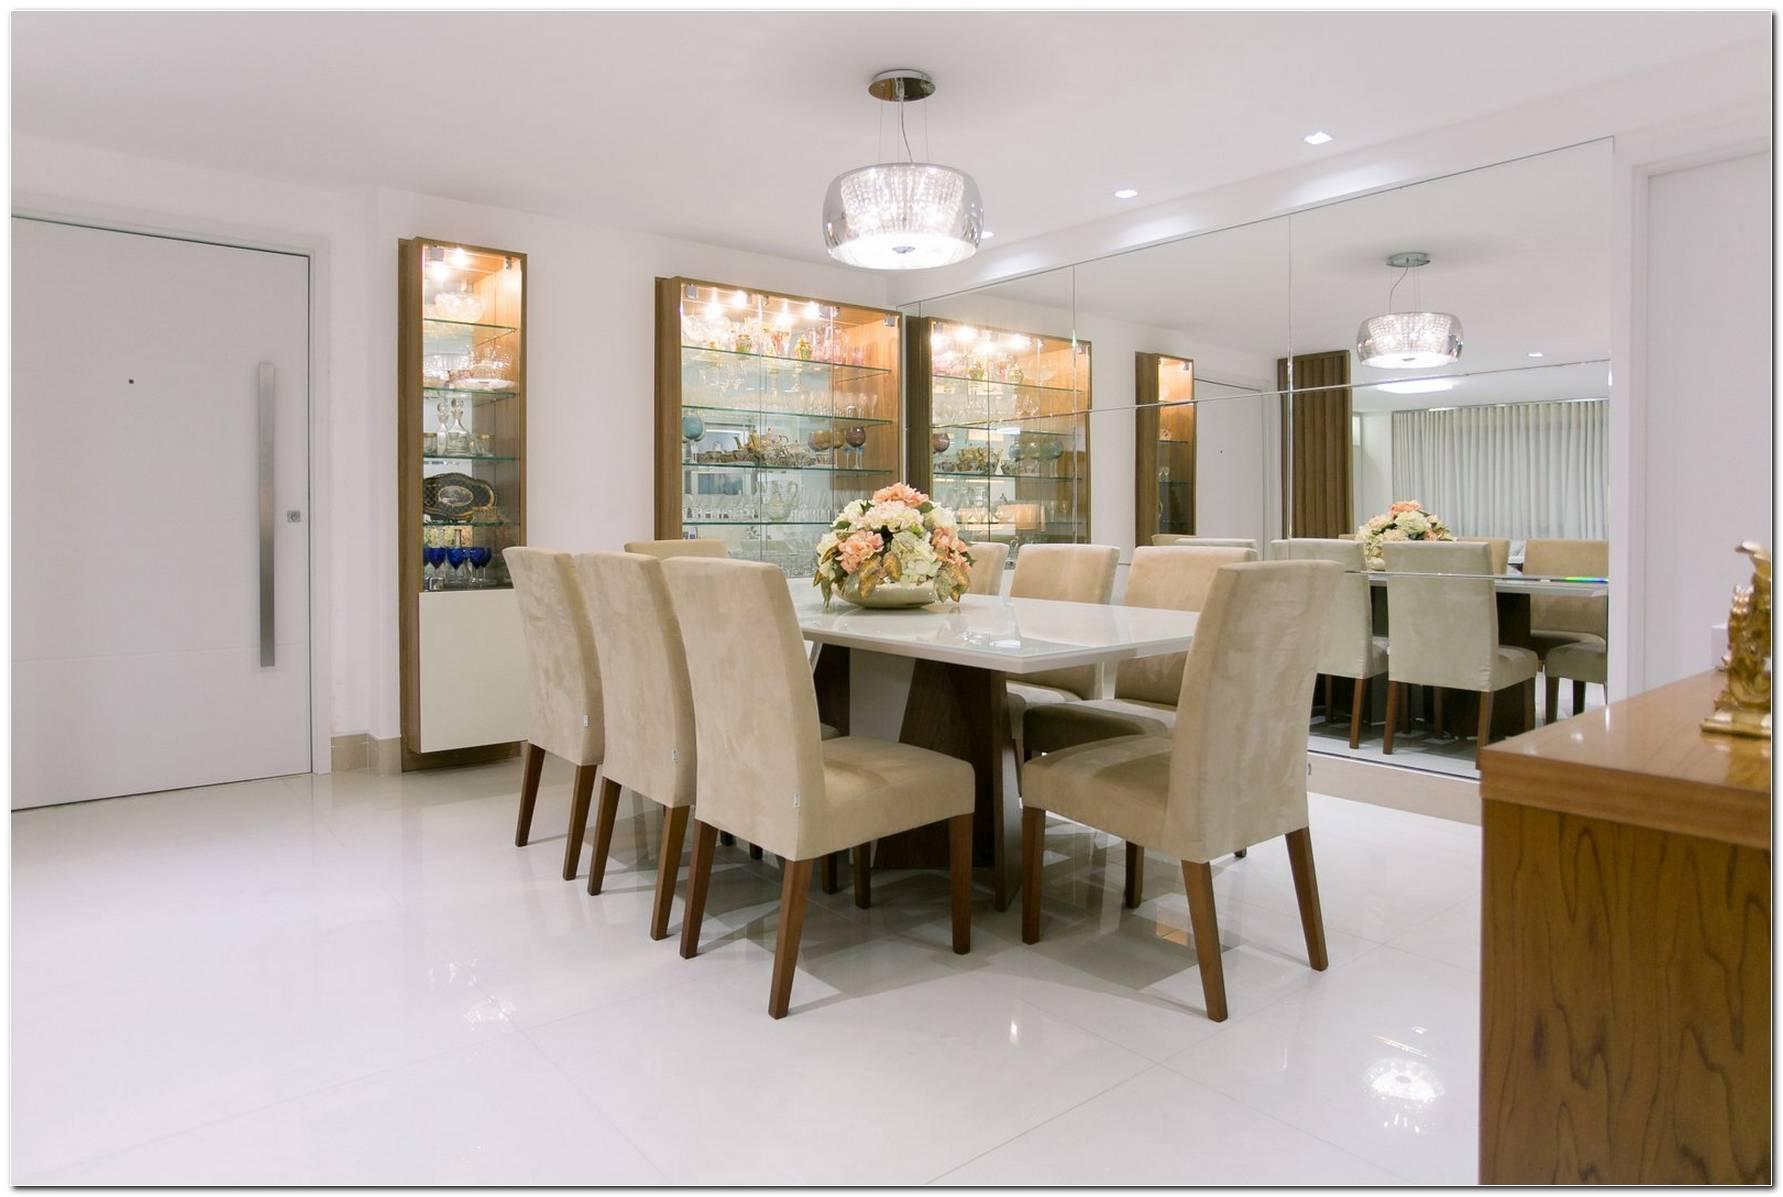 Sala De Jantar Planejada Pequena